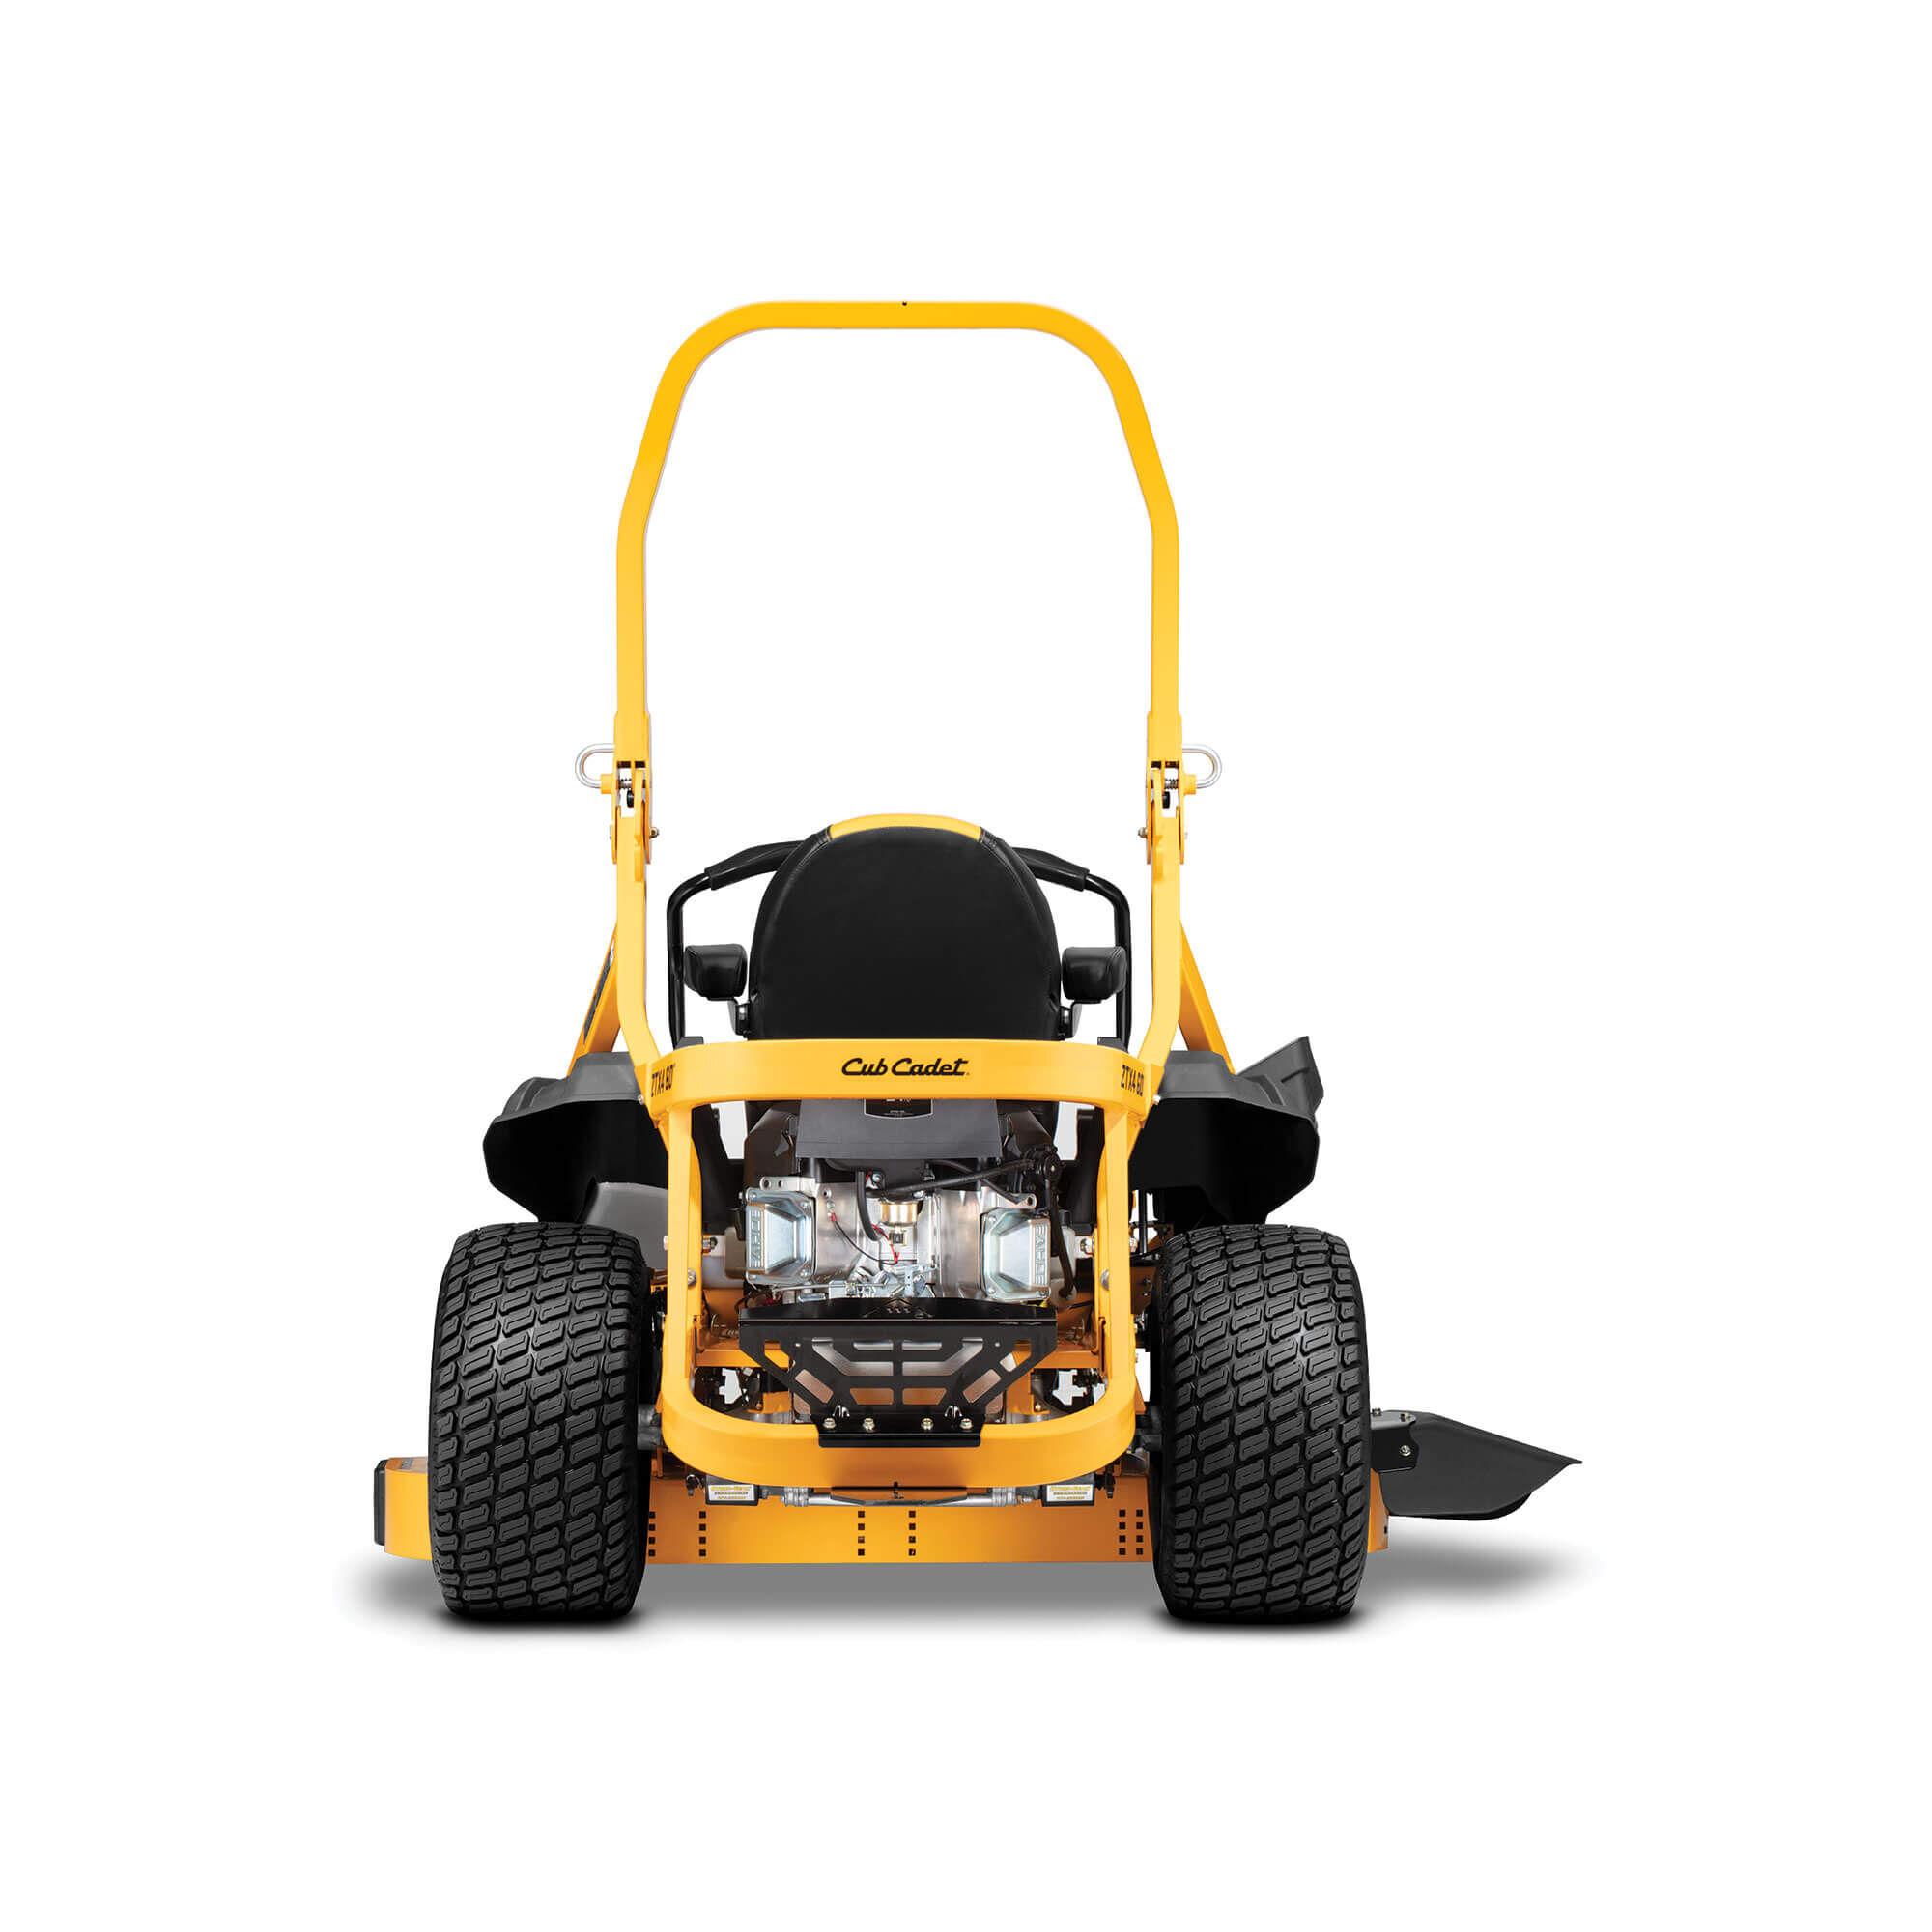 Cub Cadet Volunteer Utility Vehicle 4x4 High Quality Bearing for Rear Wheel